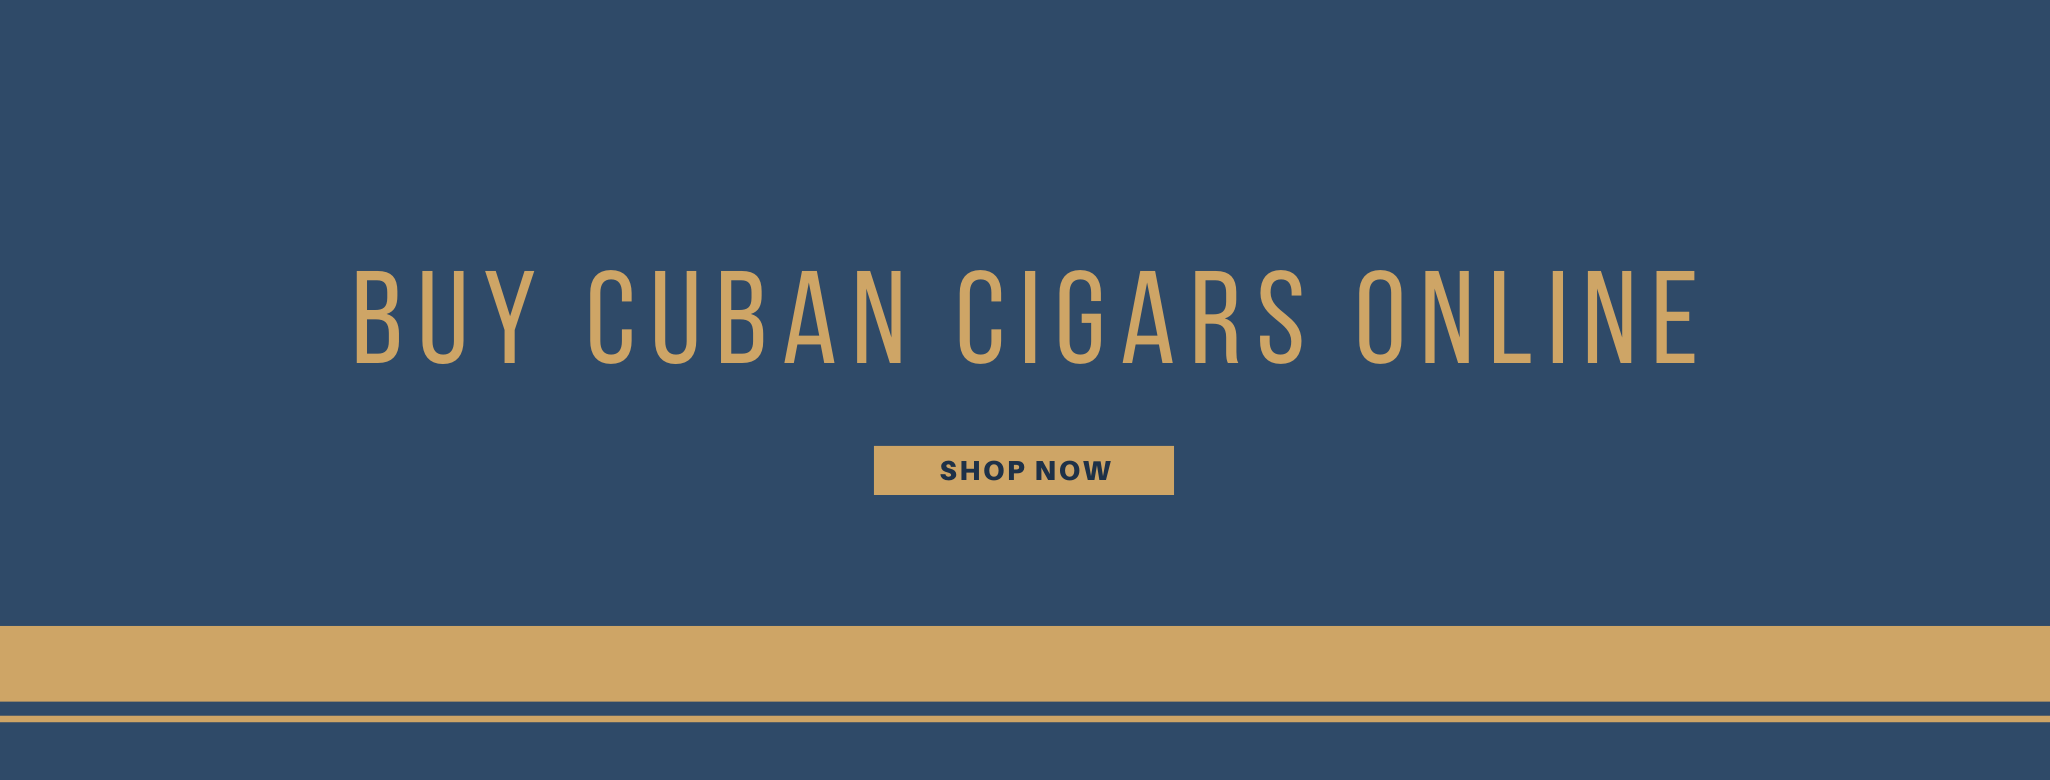 buy cuban cigars banner